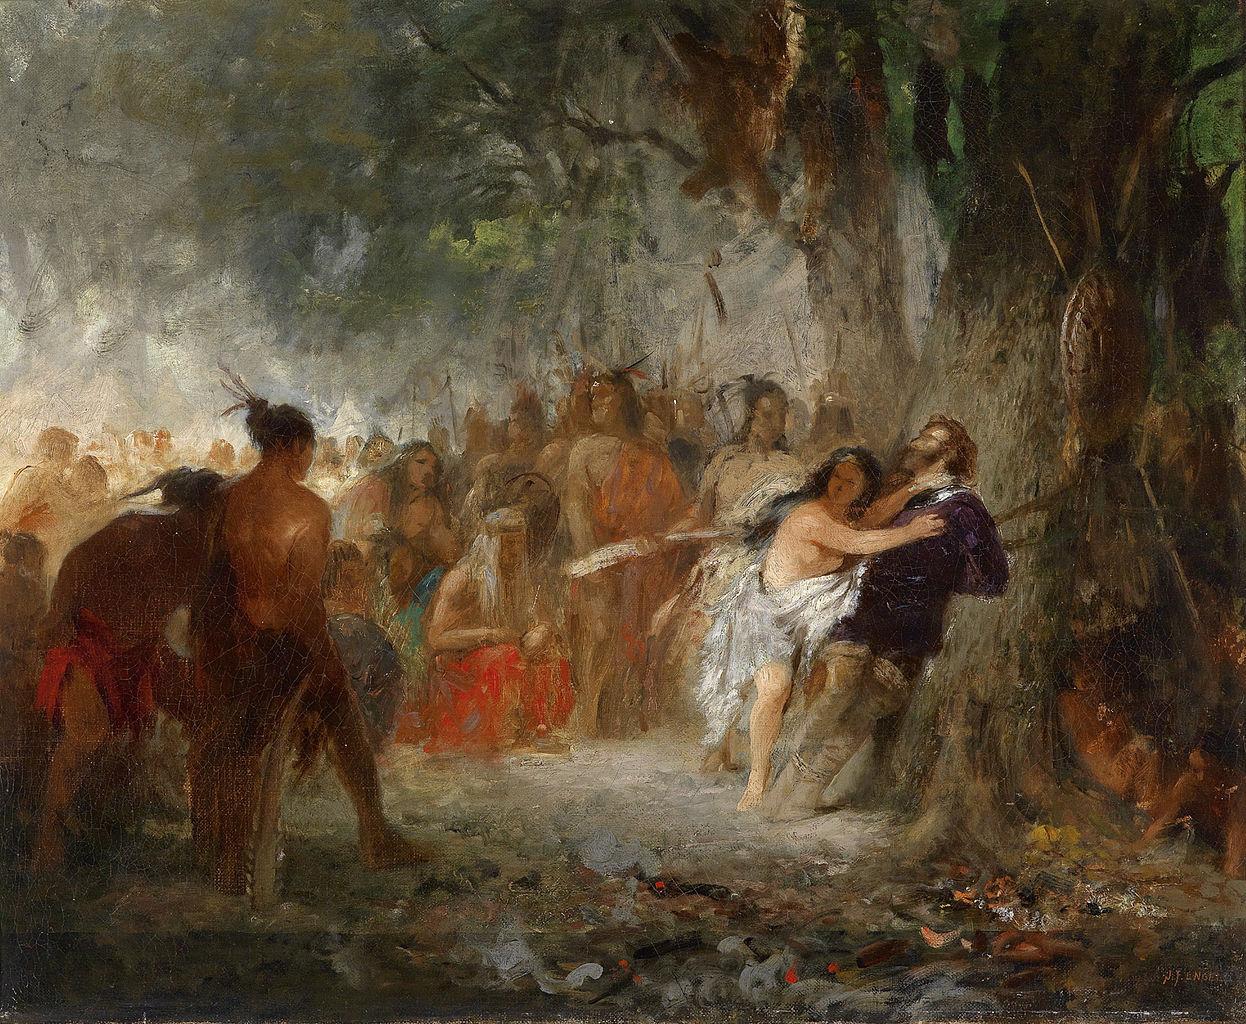 Pocahontas Saves the Life of Captain John Smith by Johann Friedrich Engel, oil painting